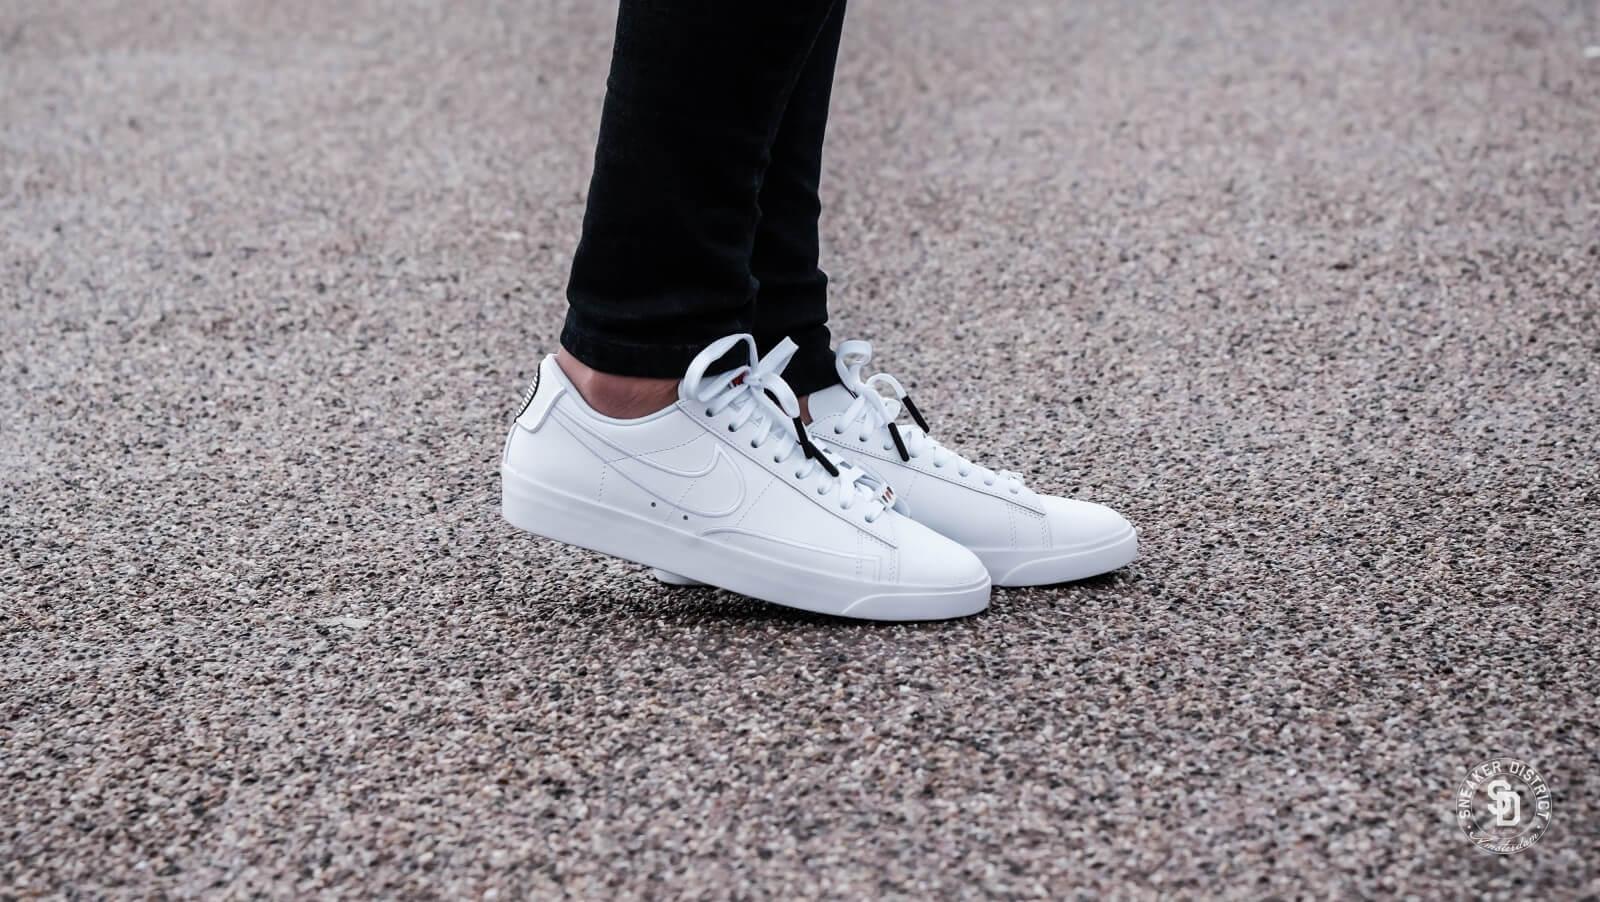 Nike Blazer City Low LX Black White   Where To Buy